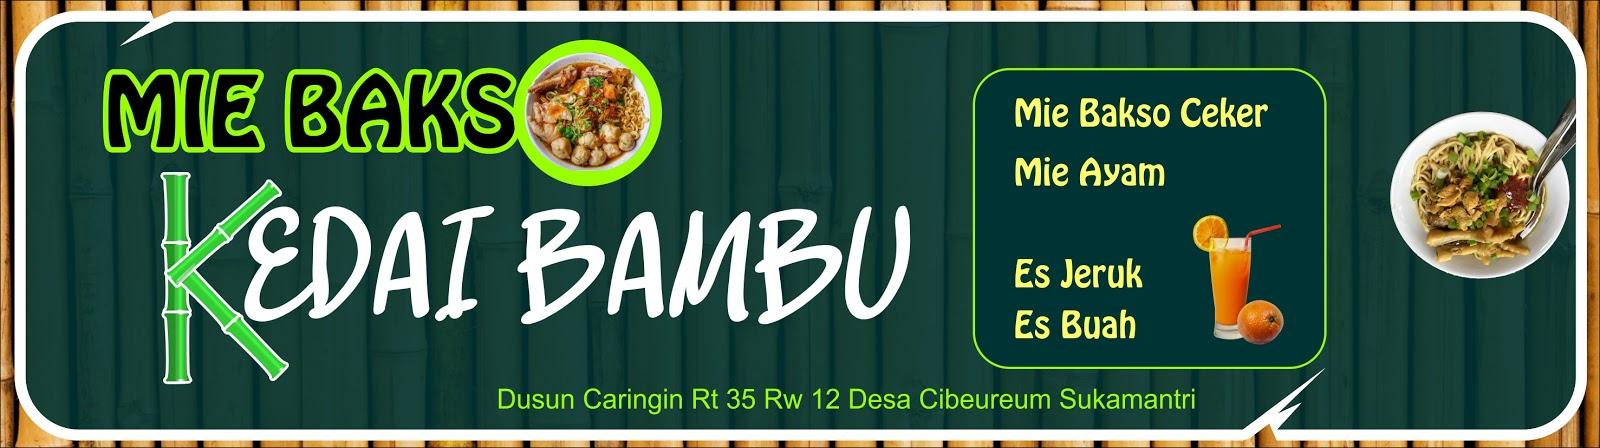 Download Template Desain Spanduk Mie Bakso Kedai Bambu cdr ...